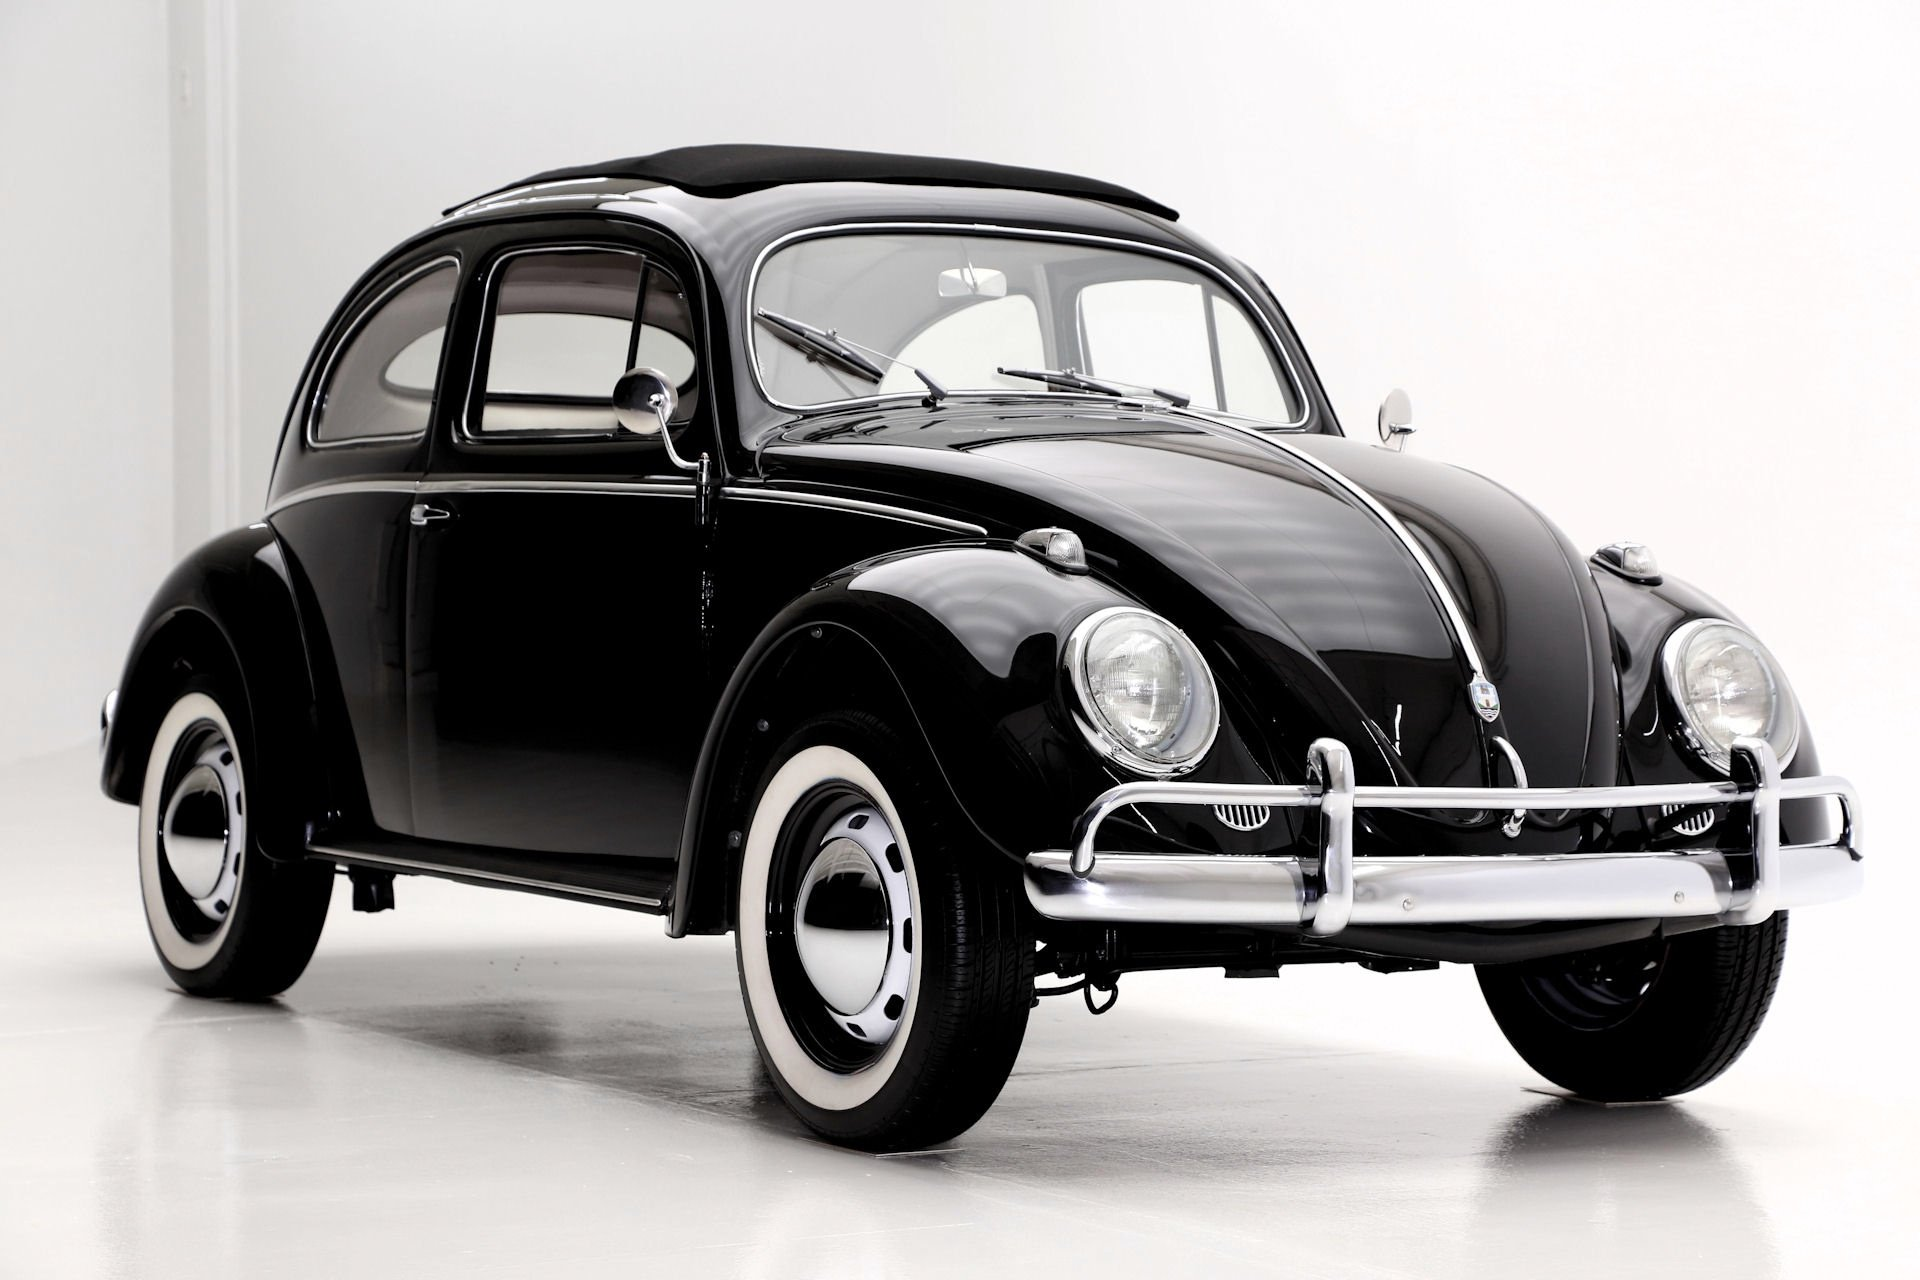 1957 volkswagen beetle classic wallpaper 1920x1280 857893 wallpaperup. Black Bedroom Furniture Sets. Home Design Ideas